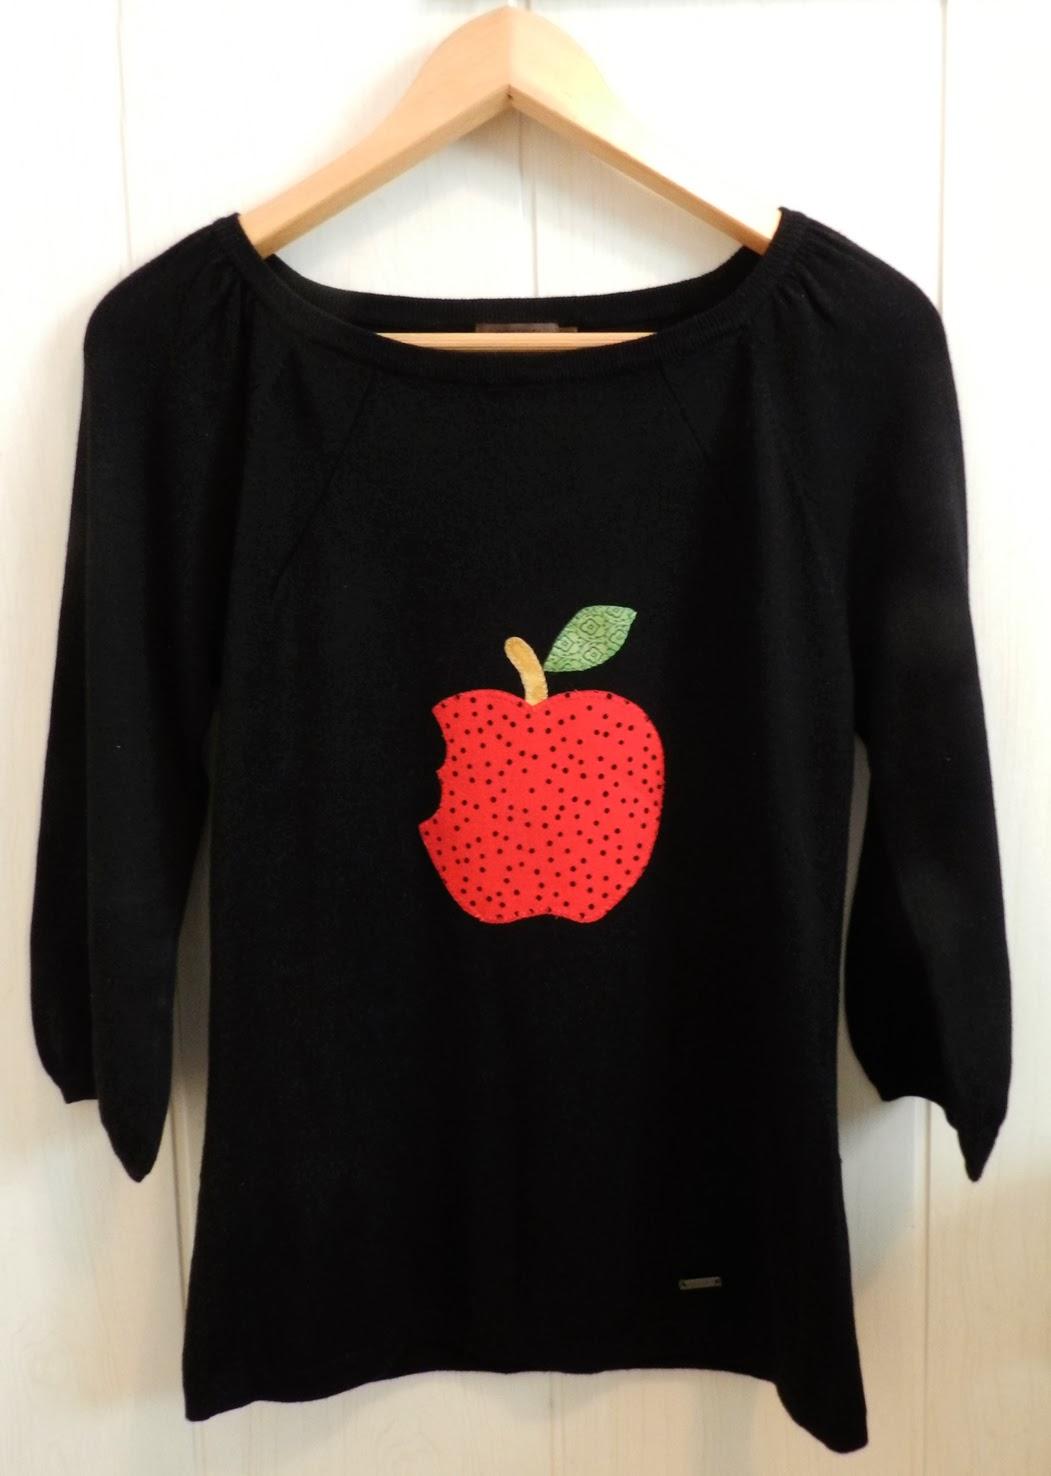 Camisetas patchwork, camiseta patchwork, camiseta con aplicaciones patchwork, aplicaciones, manzana mordida, camiseta, camiseta manzana mordida, camiseta adulto patchwork, camiseta mujer,